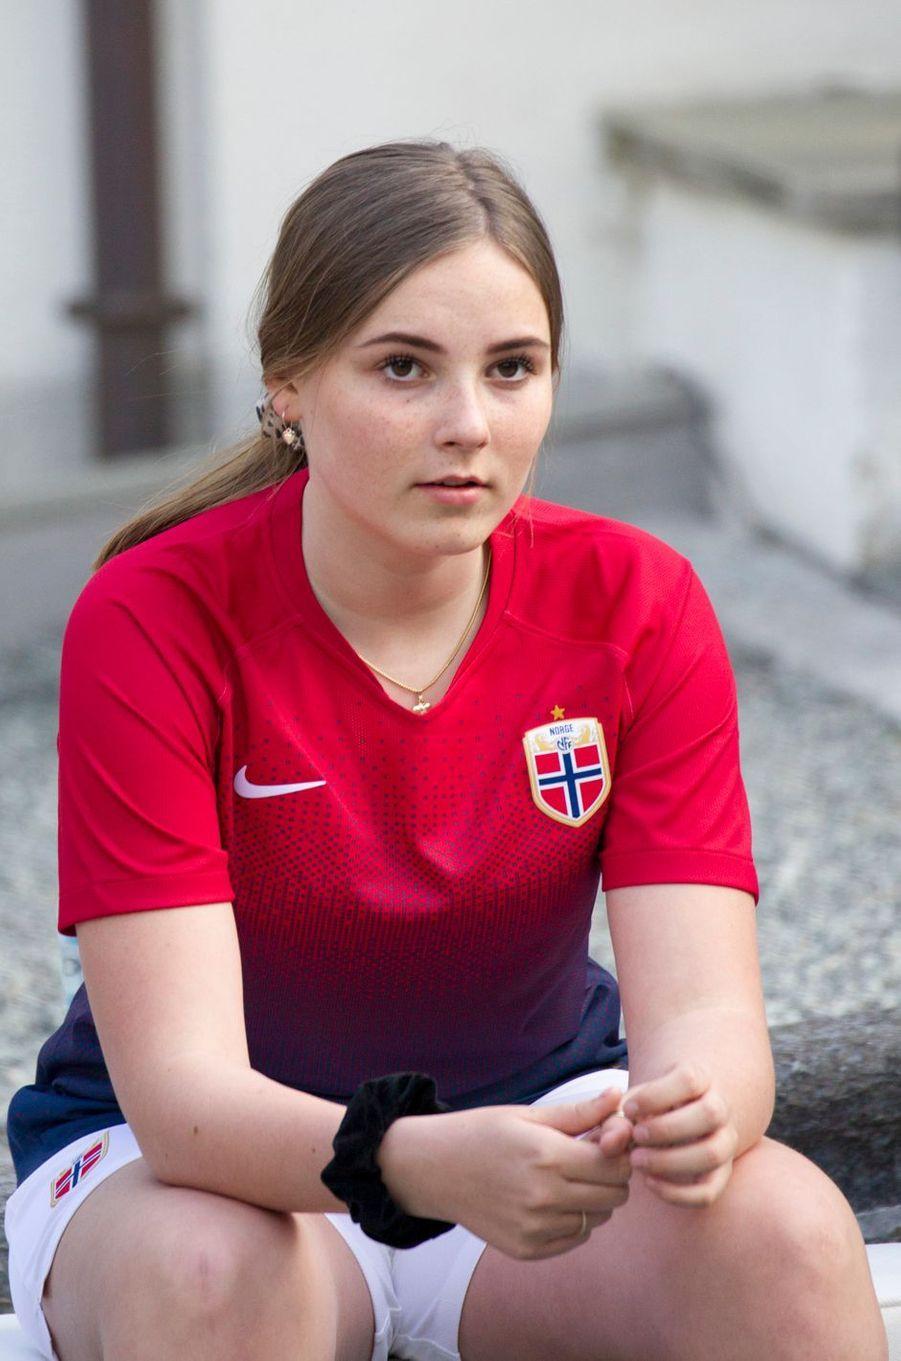 La princesse Ingrid Alexandra de Norvège à Asker, le 29 mai 2019